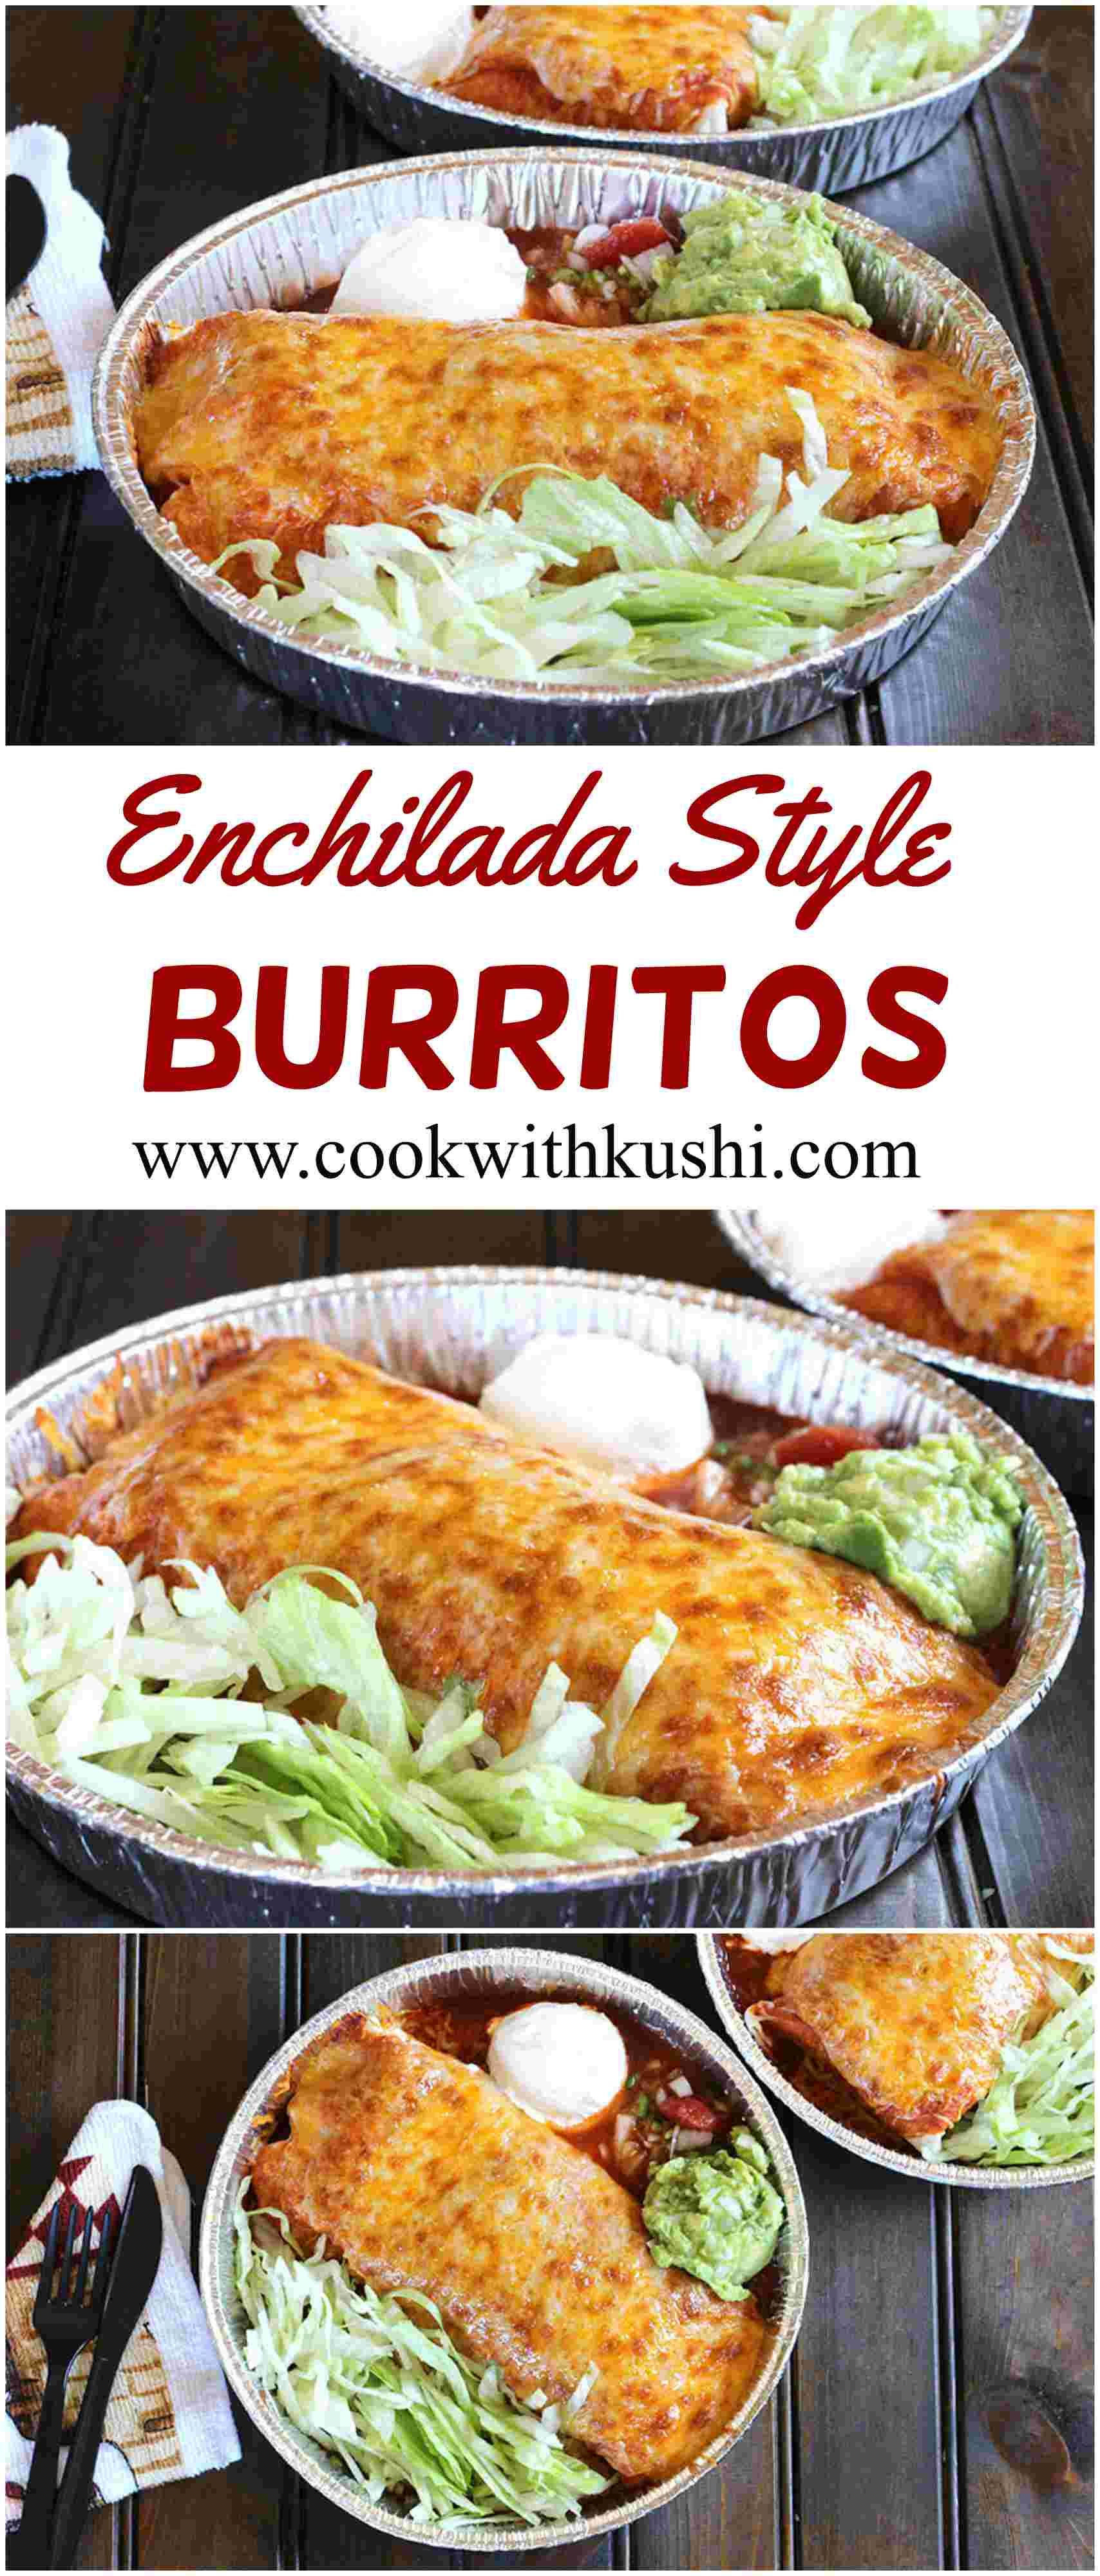 recept burritos enchiladas